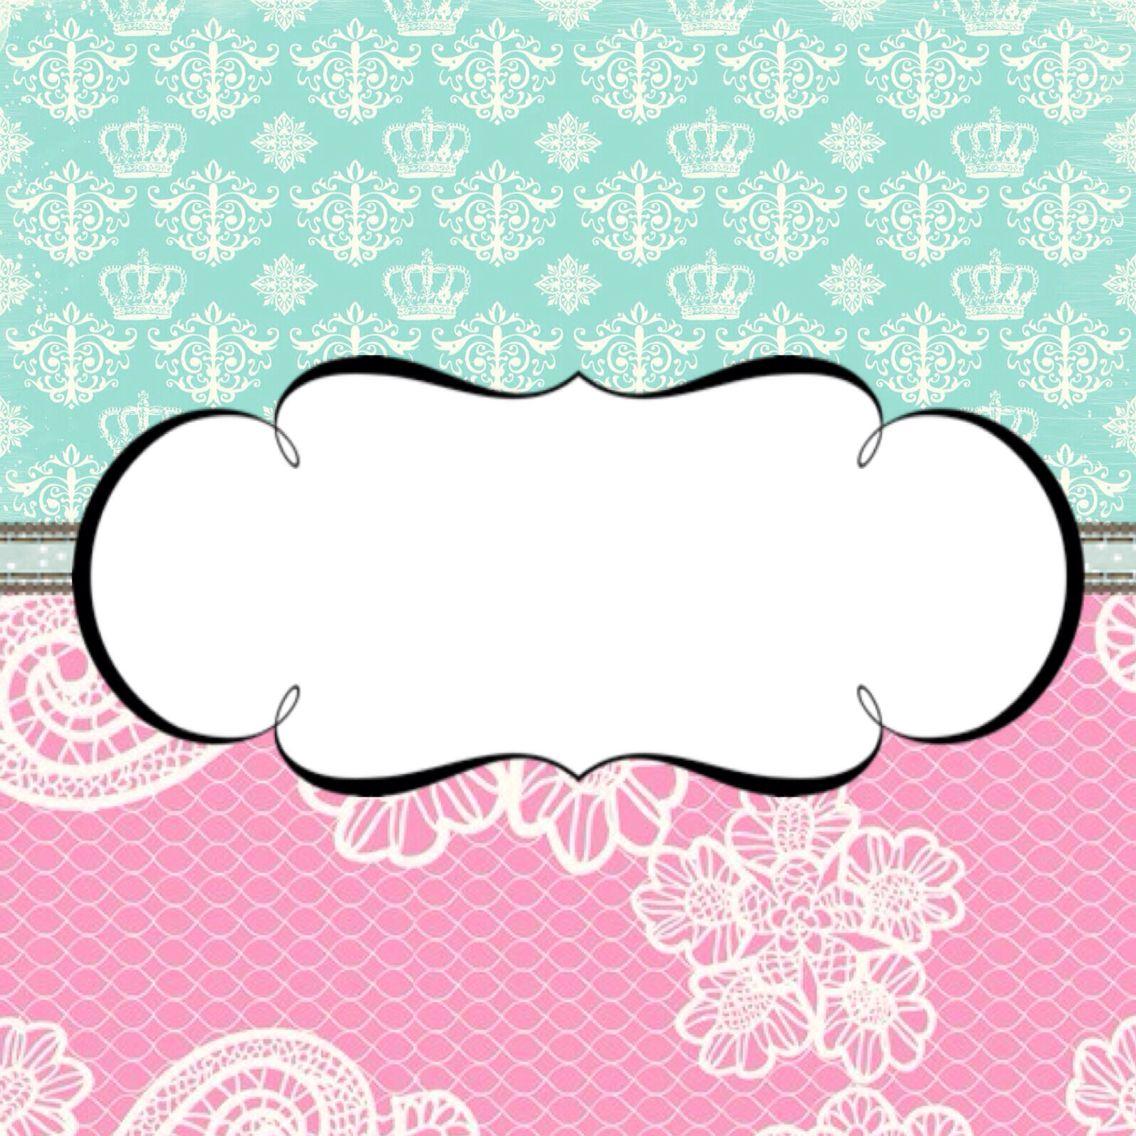 Sweet #freelabel #labeldesign #eveiolabel #owndesign #girlylabel #vintagelabel #cutelabel #blackandpink #cutelabel